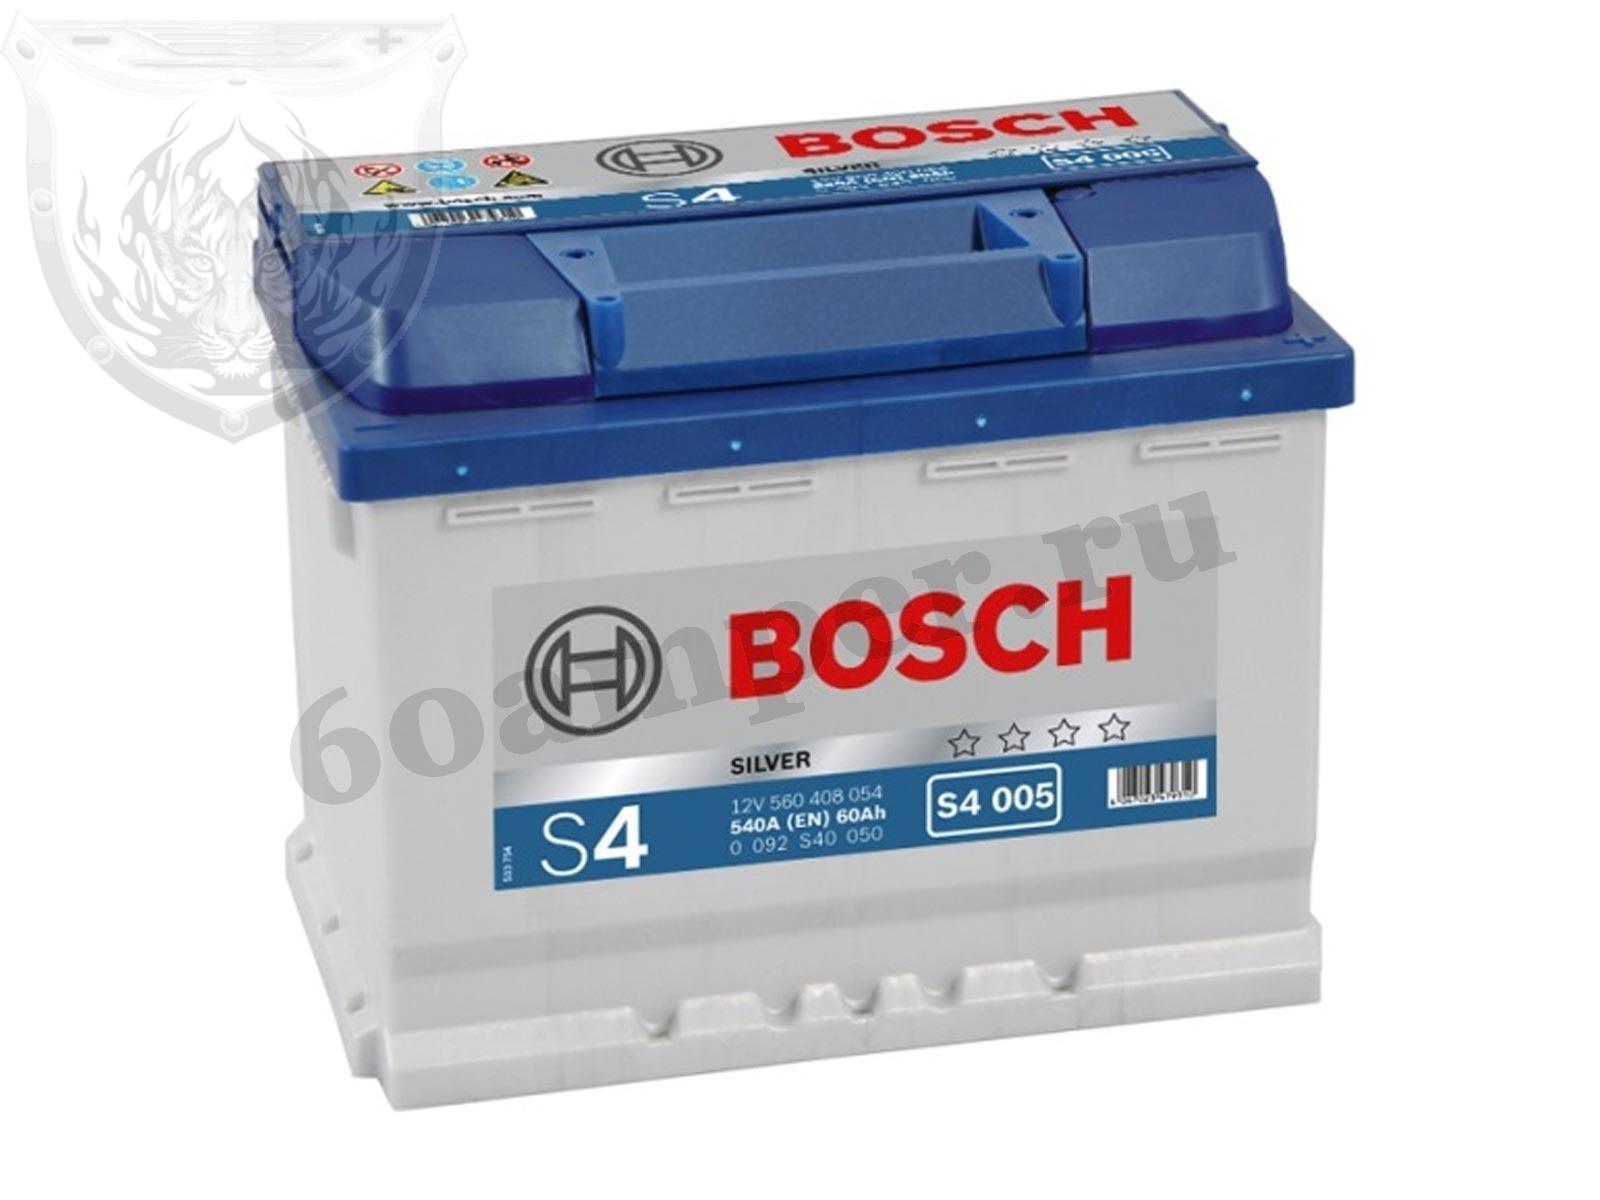 BOSCH 60 А/ч Обратный S4 005 SILVER (560 408 054)